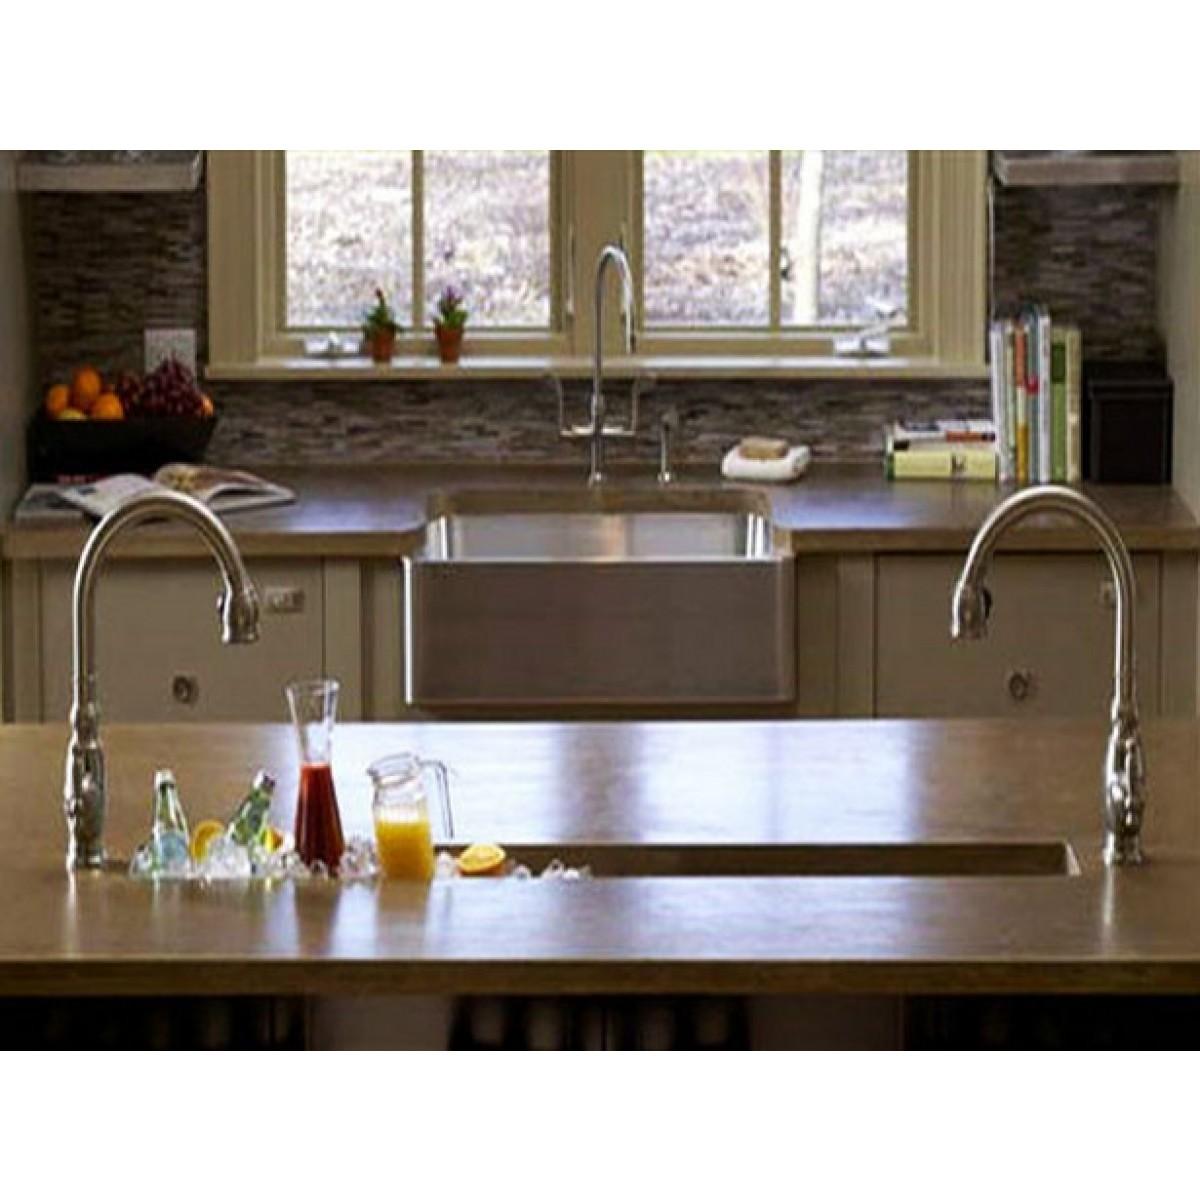 32 Inch Stainless Steel Undermount Single Narrow Bowl Kitchen / Bar / Prep  Sink Zero Radius Design